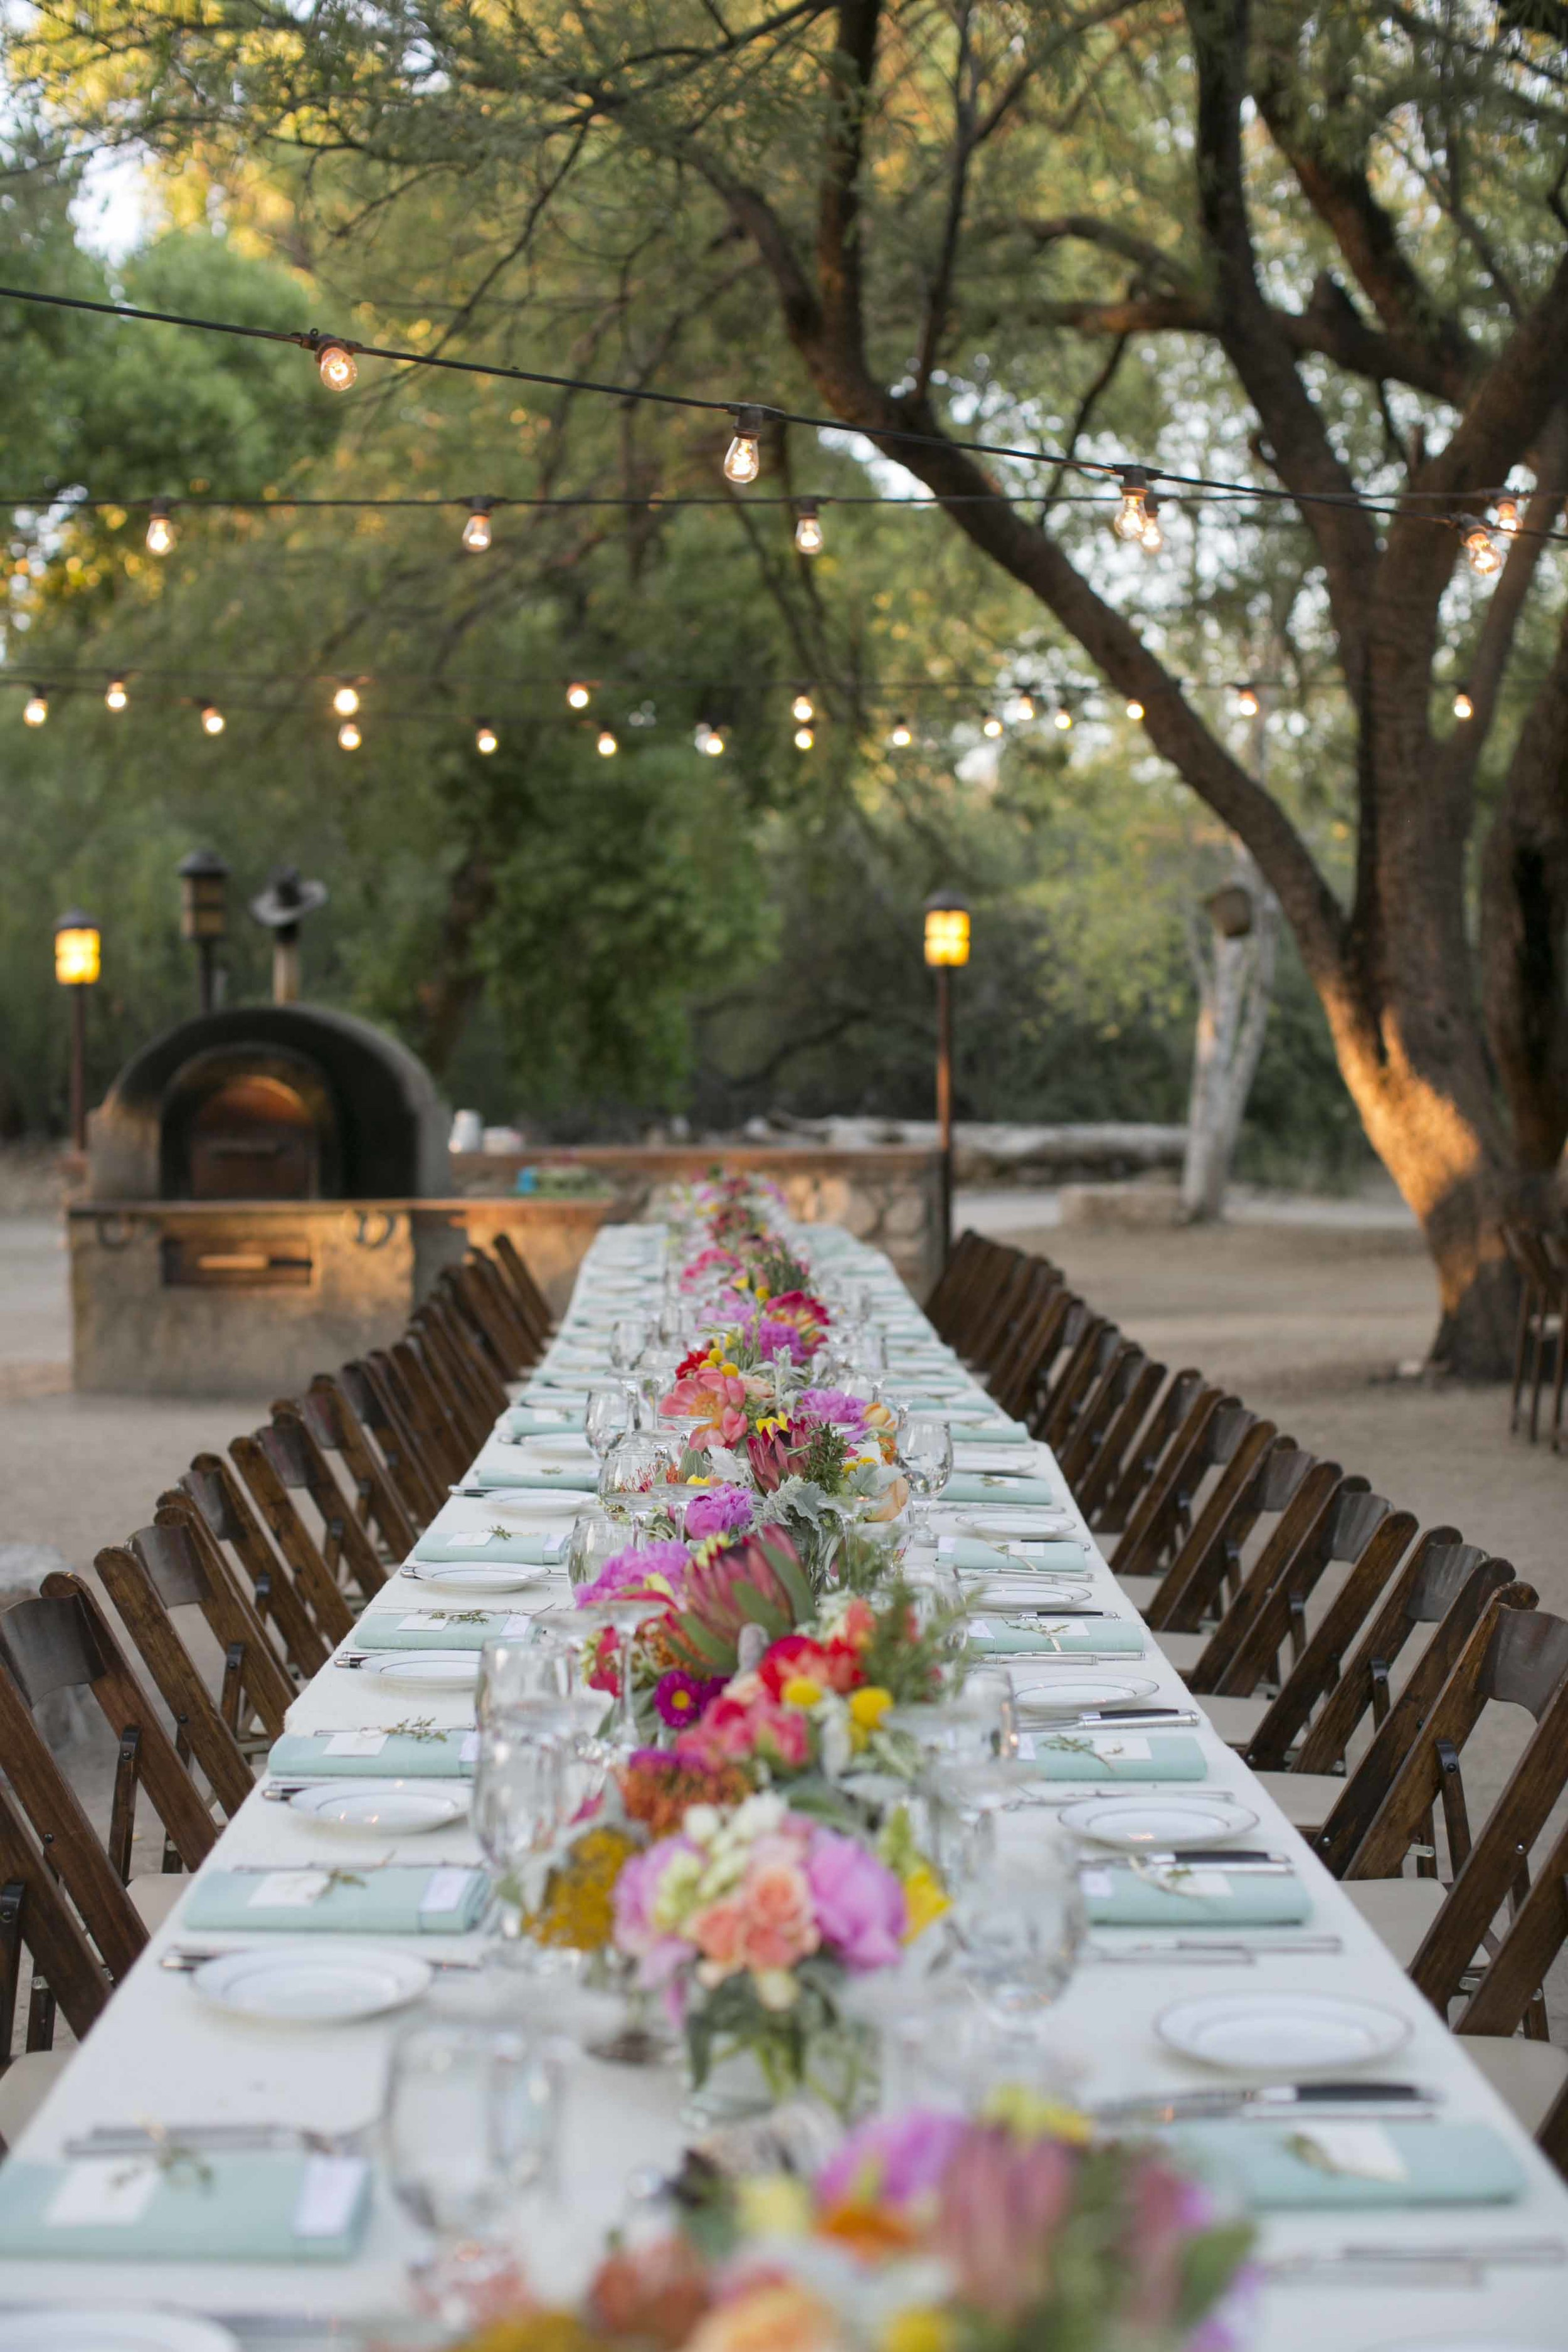 long-tables-wedding-desert-string-lights-peach-chic